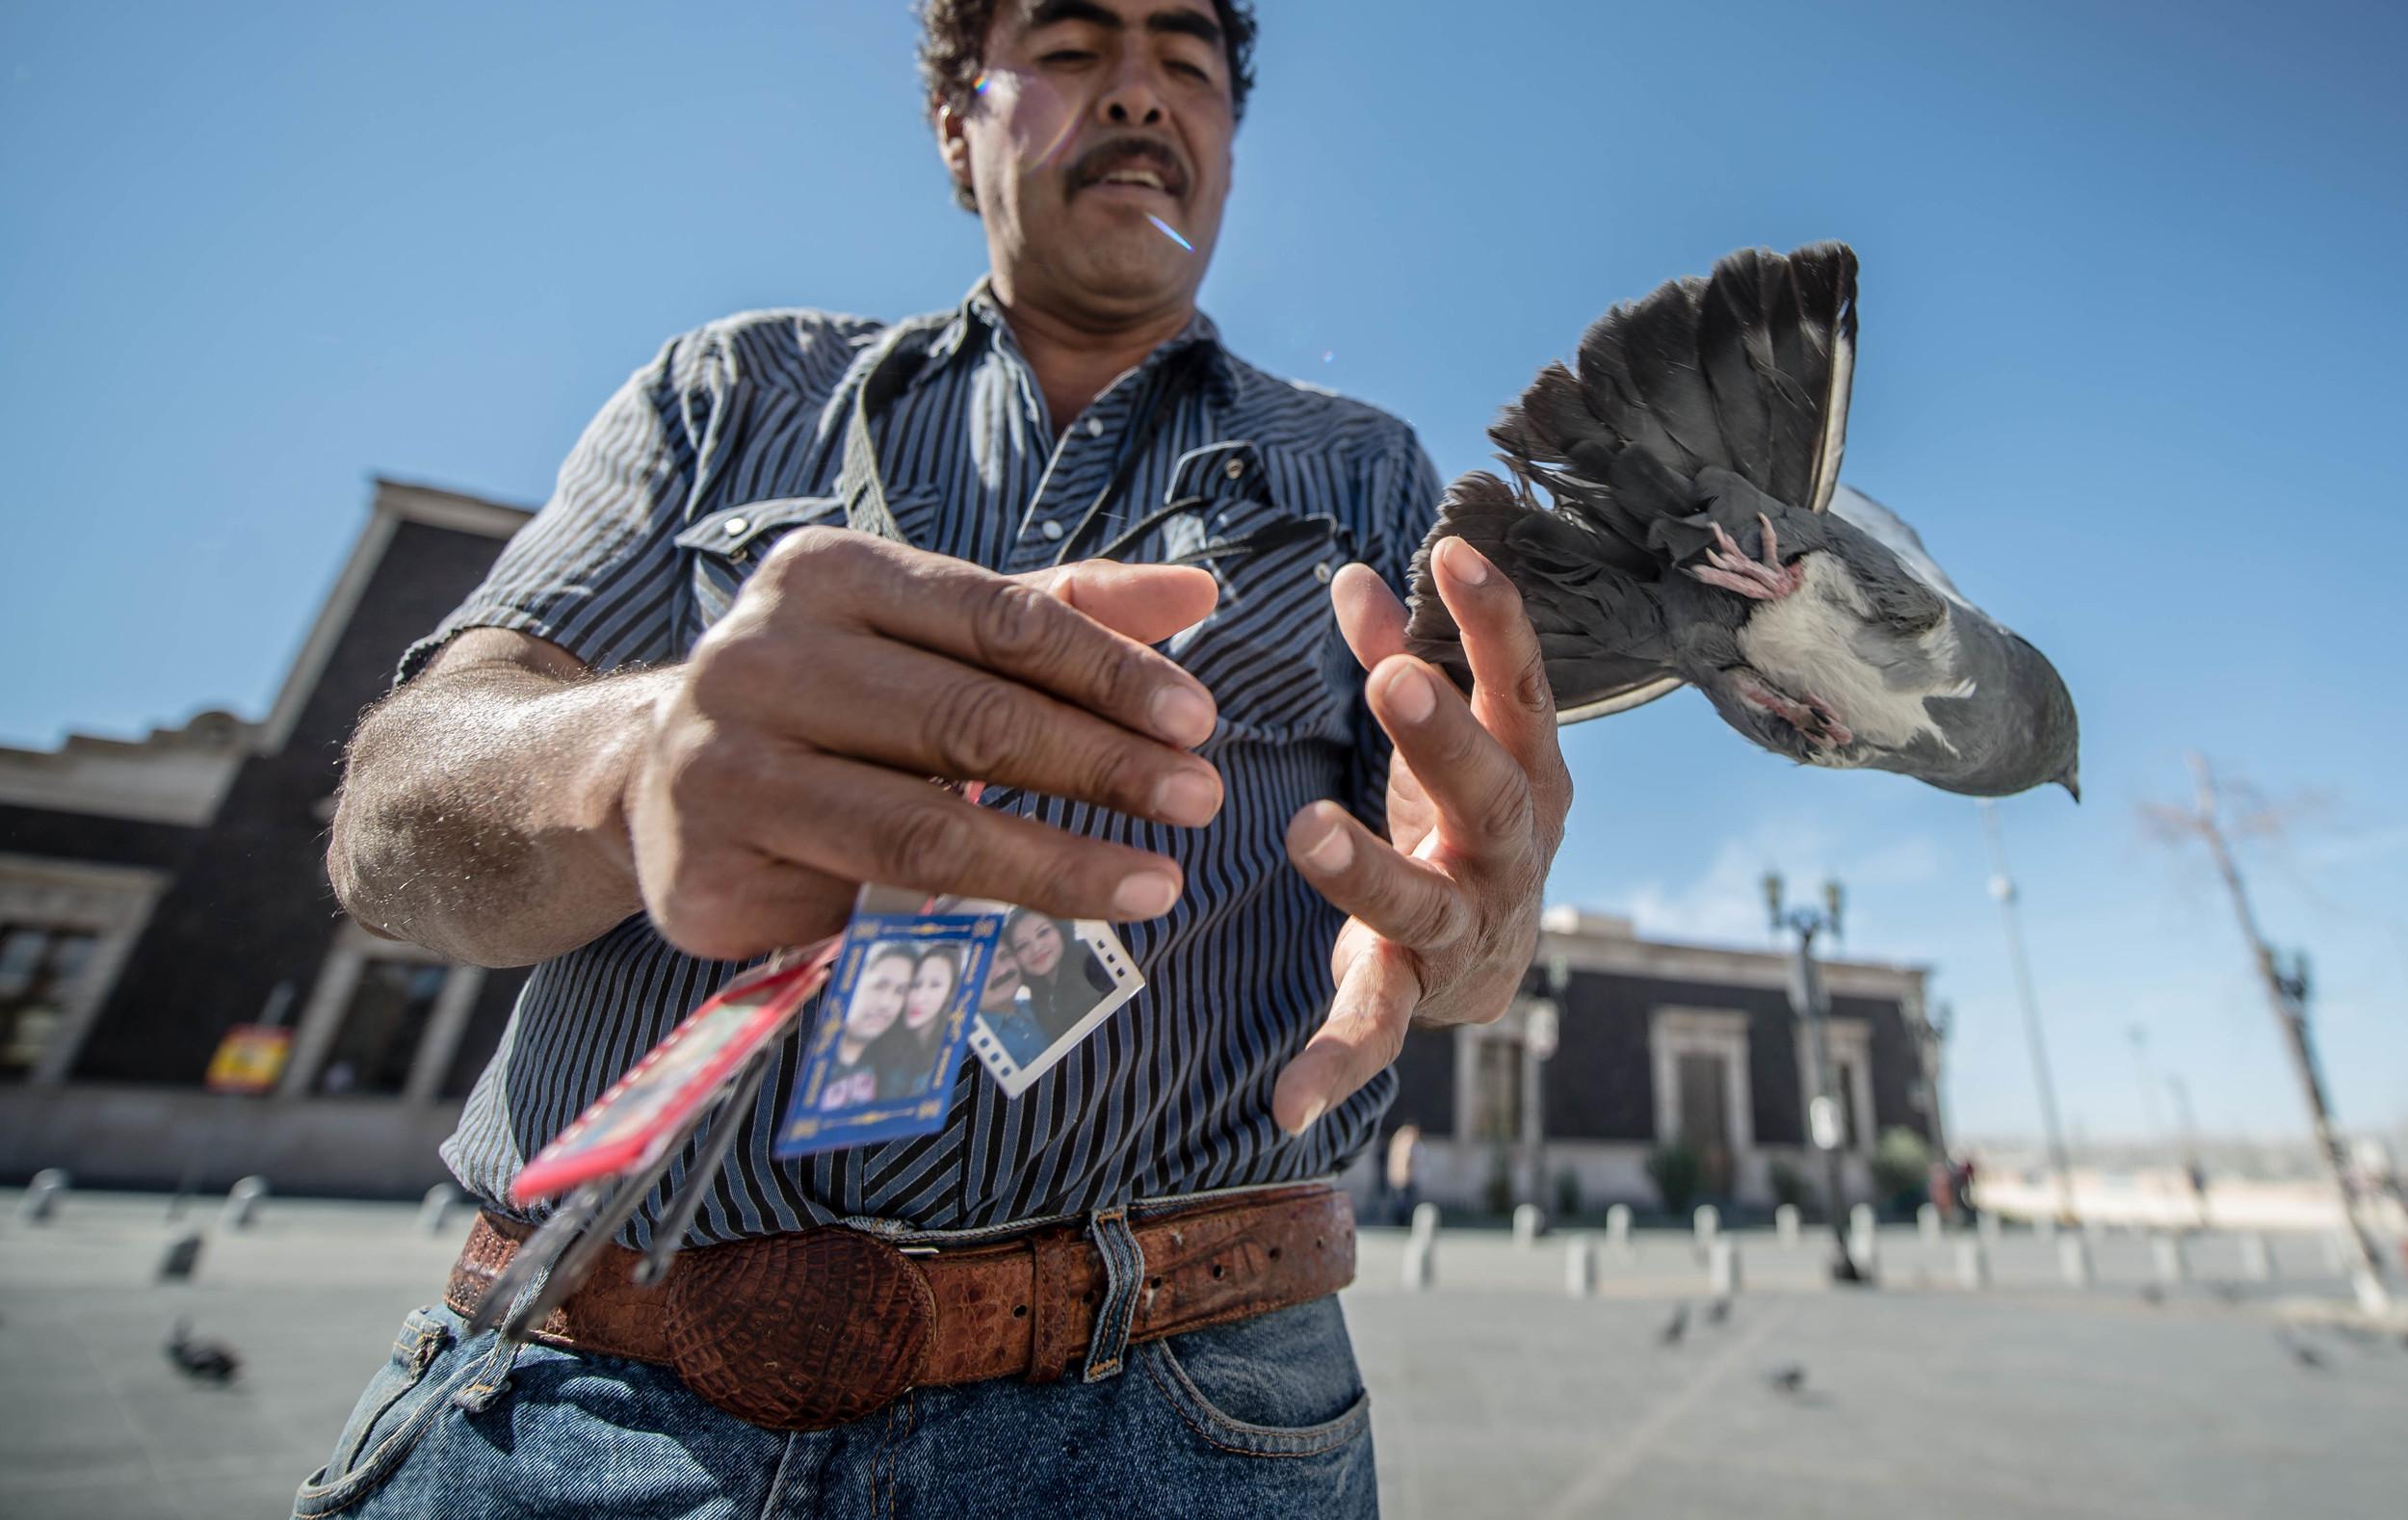 Releasing a pigeon in downtown Ciudad Juarez